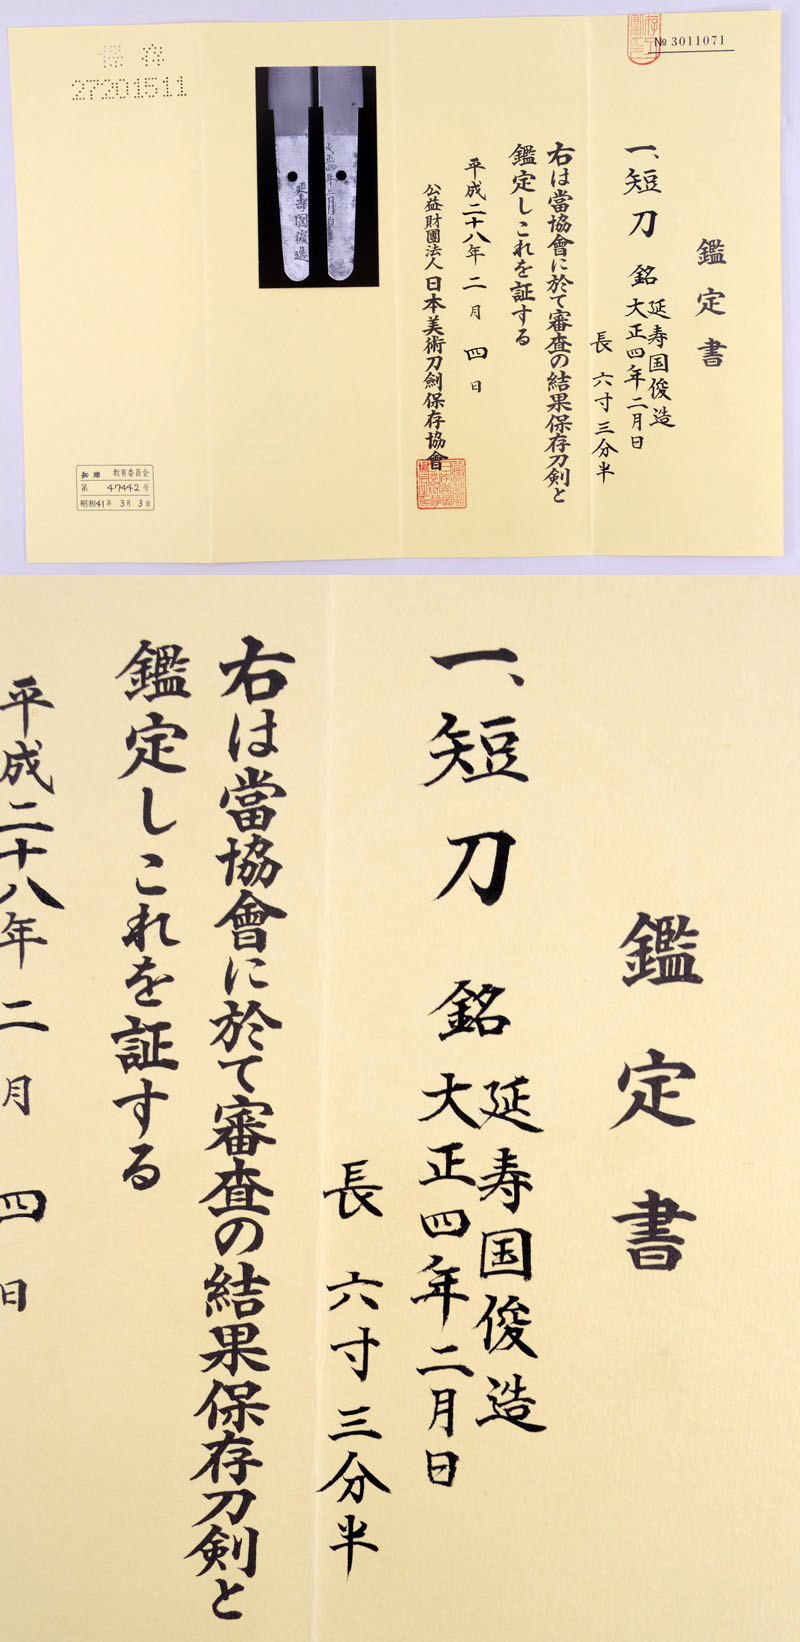 延寿国俊造 Picture of Certificate